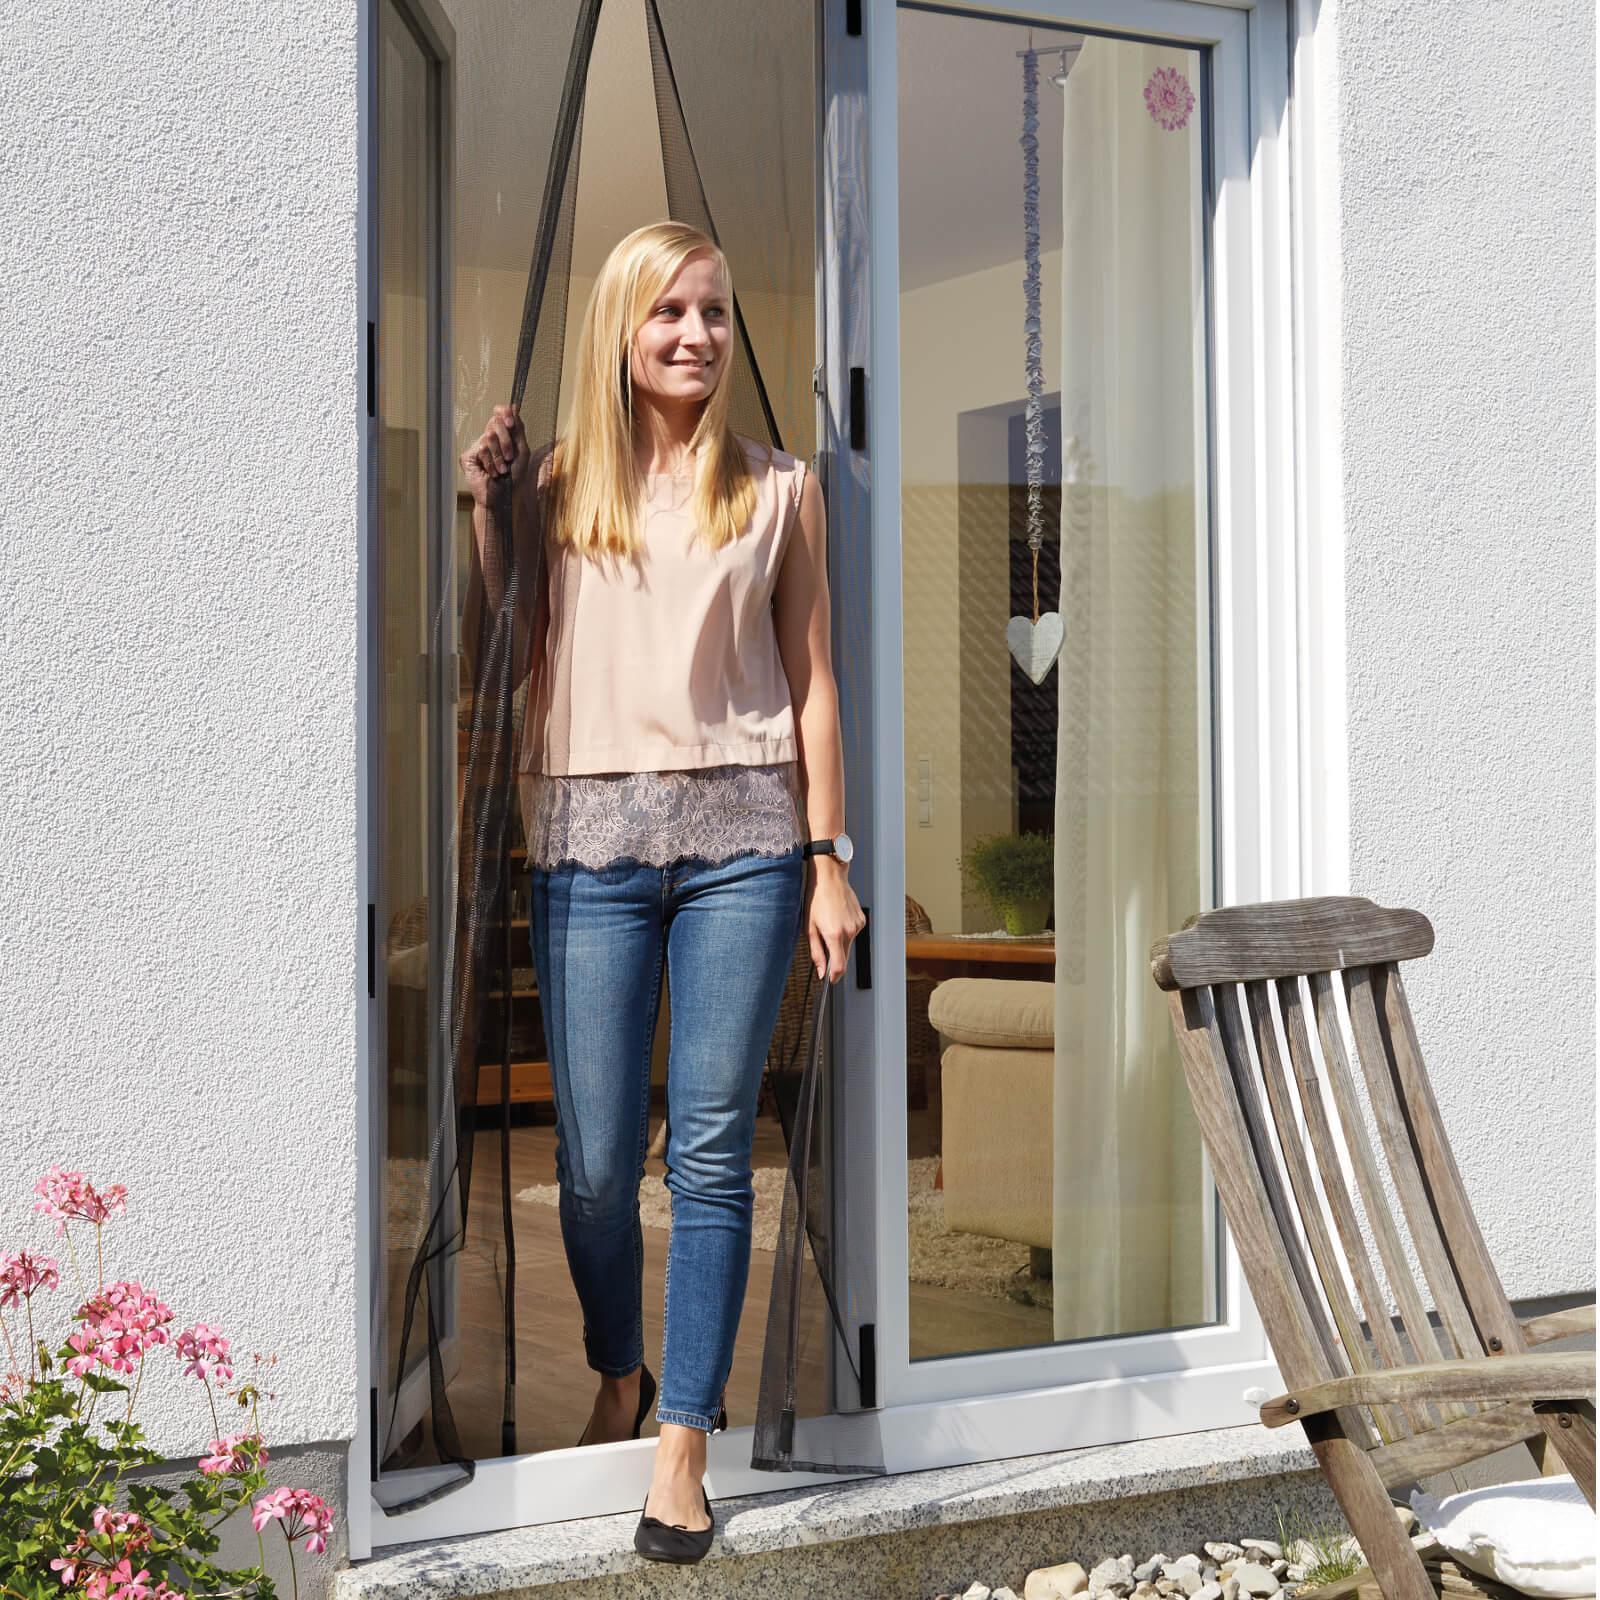 schellenberg insektenschutz magnetvorhang f r t ren 90 x 210 cm anthrazit 50640. Black Bedroom Furniture Sets. Home Design Ideas